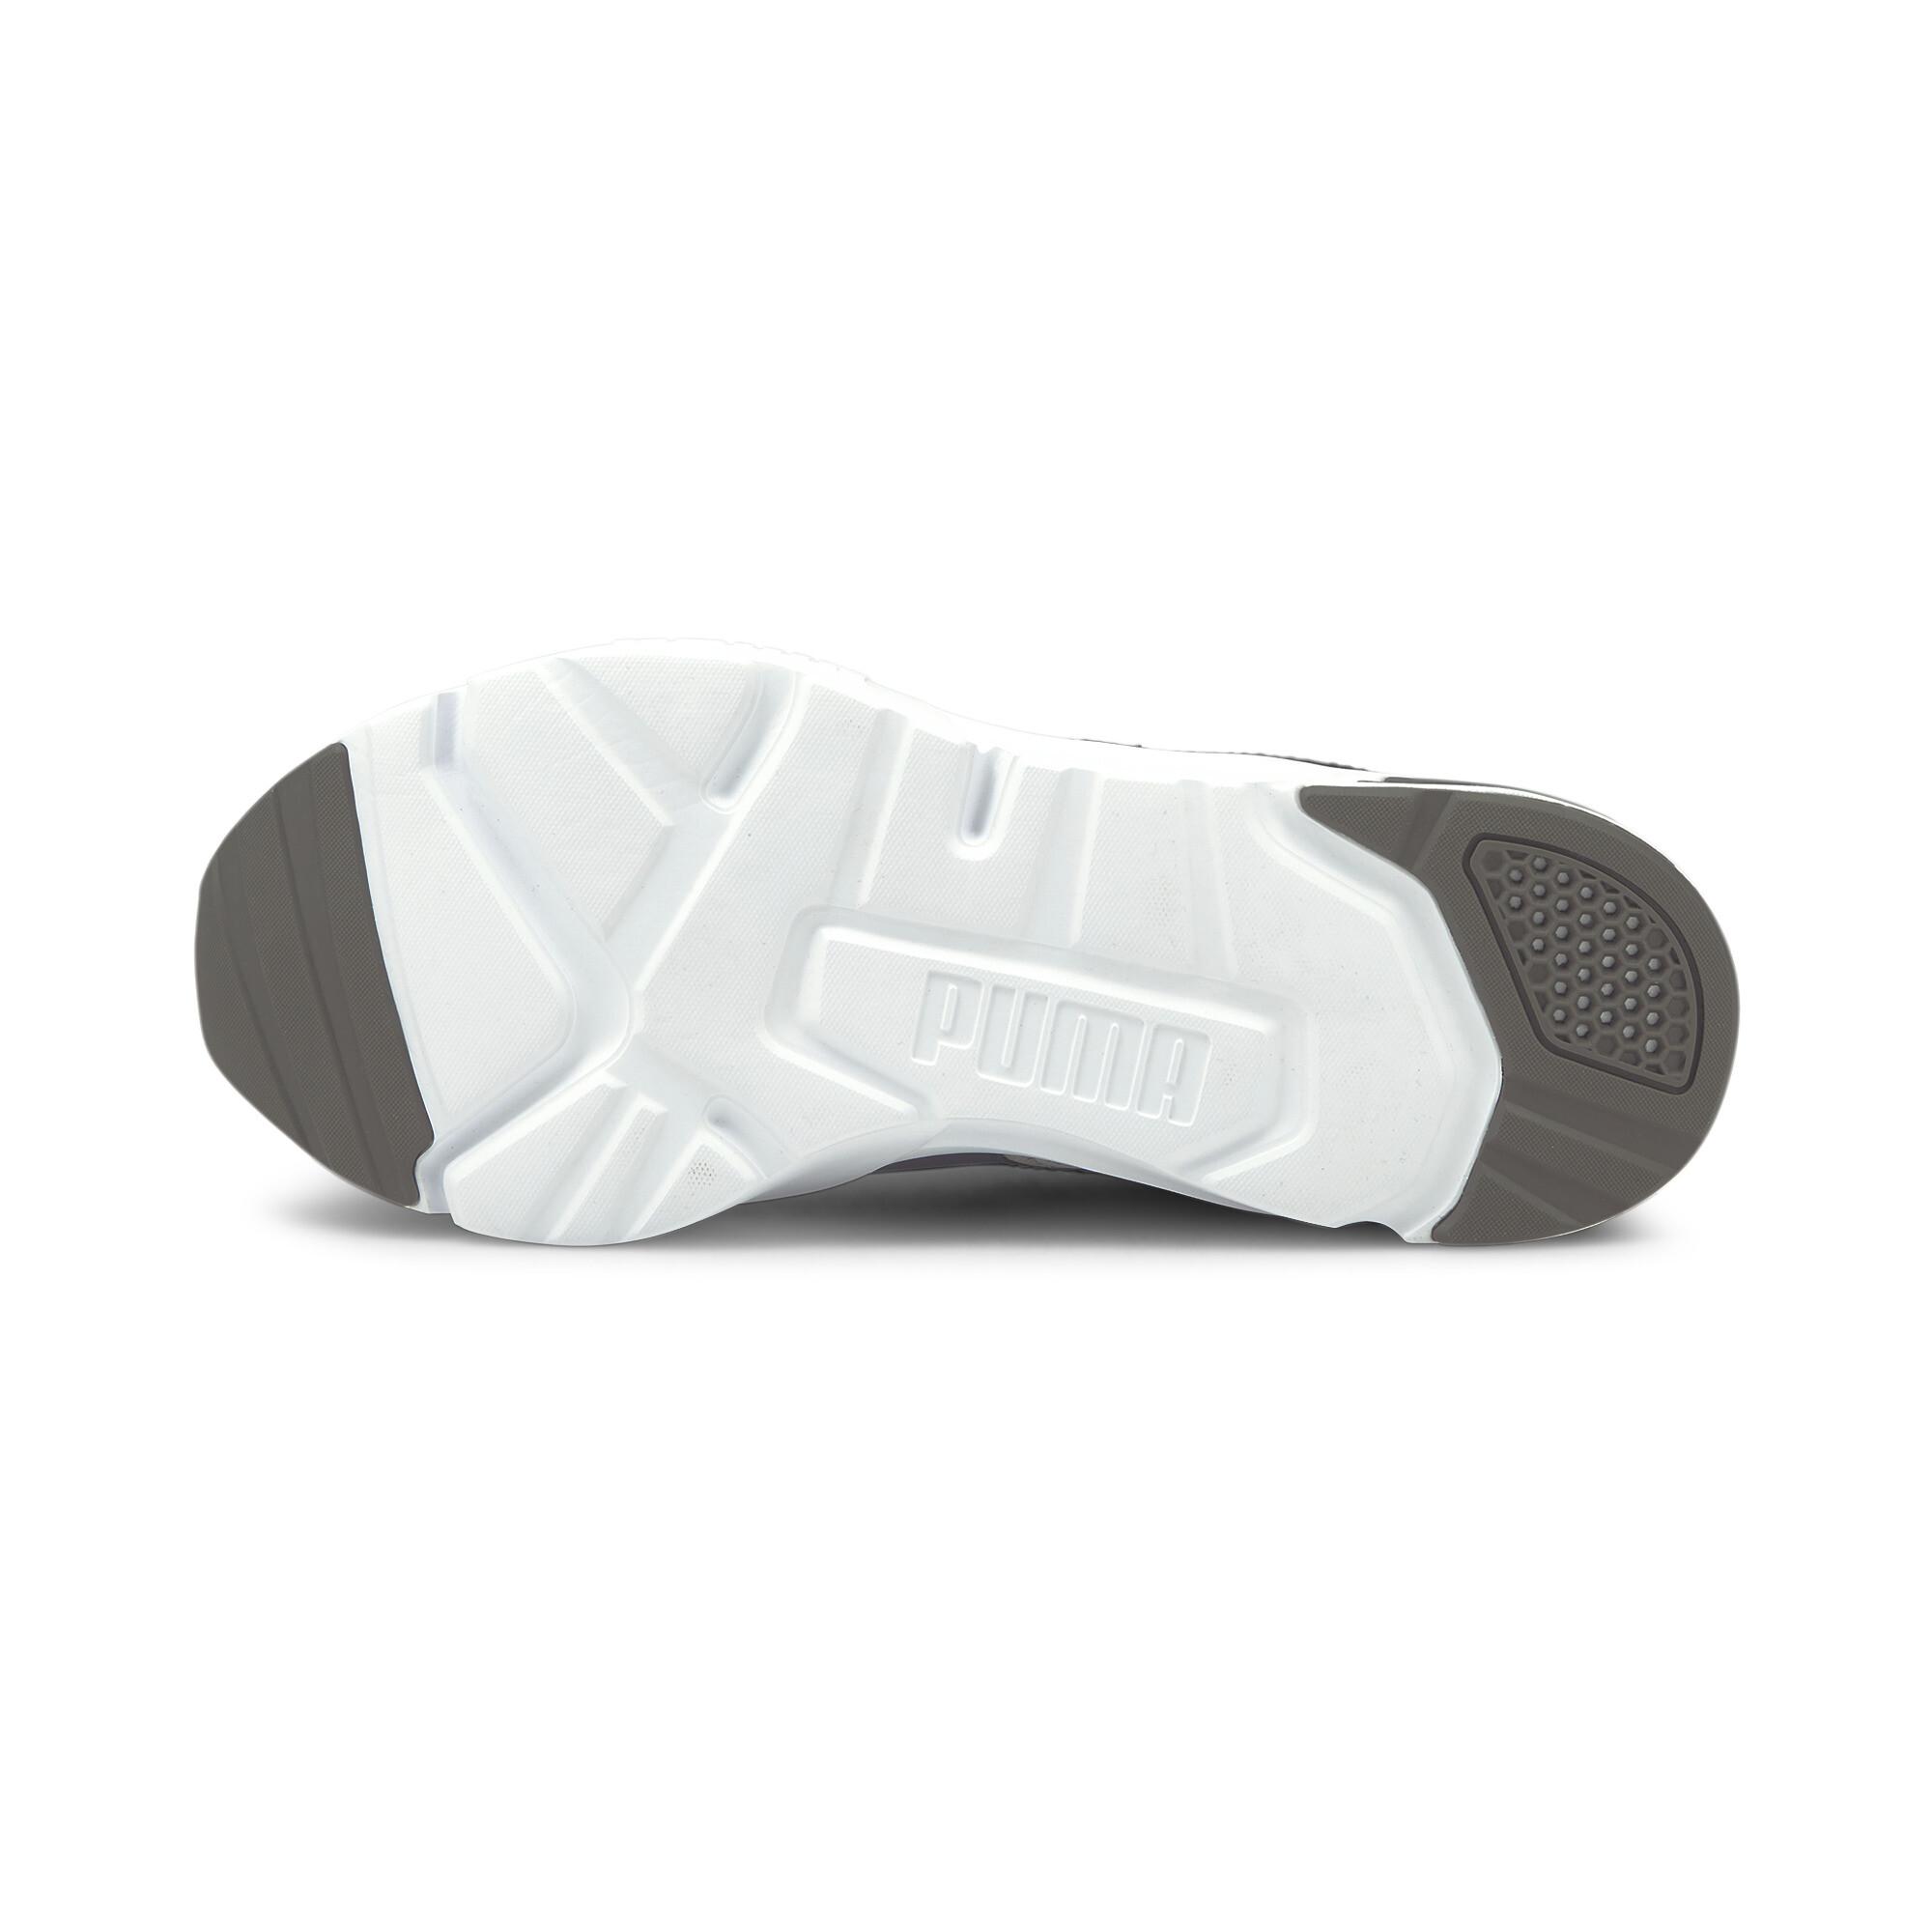 thumbnail 12 - PUMA Men's CELL Pharos Training Shoes